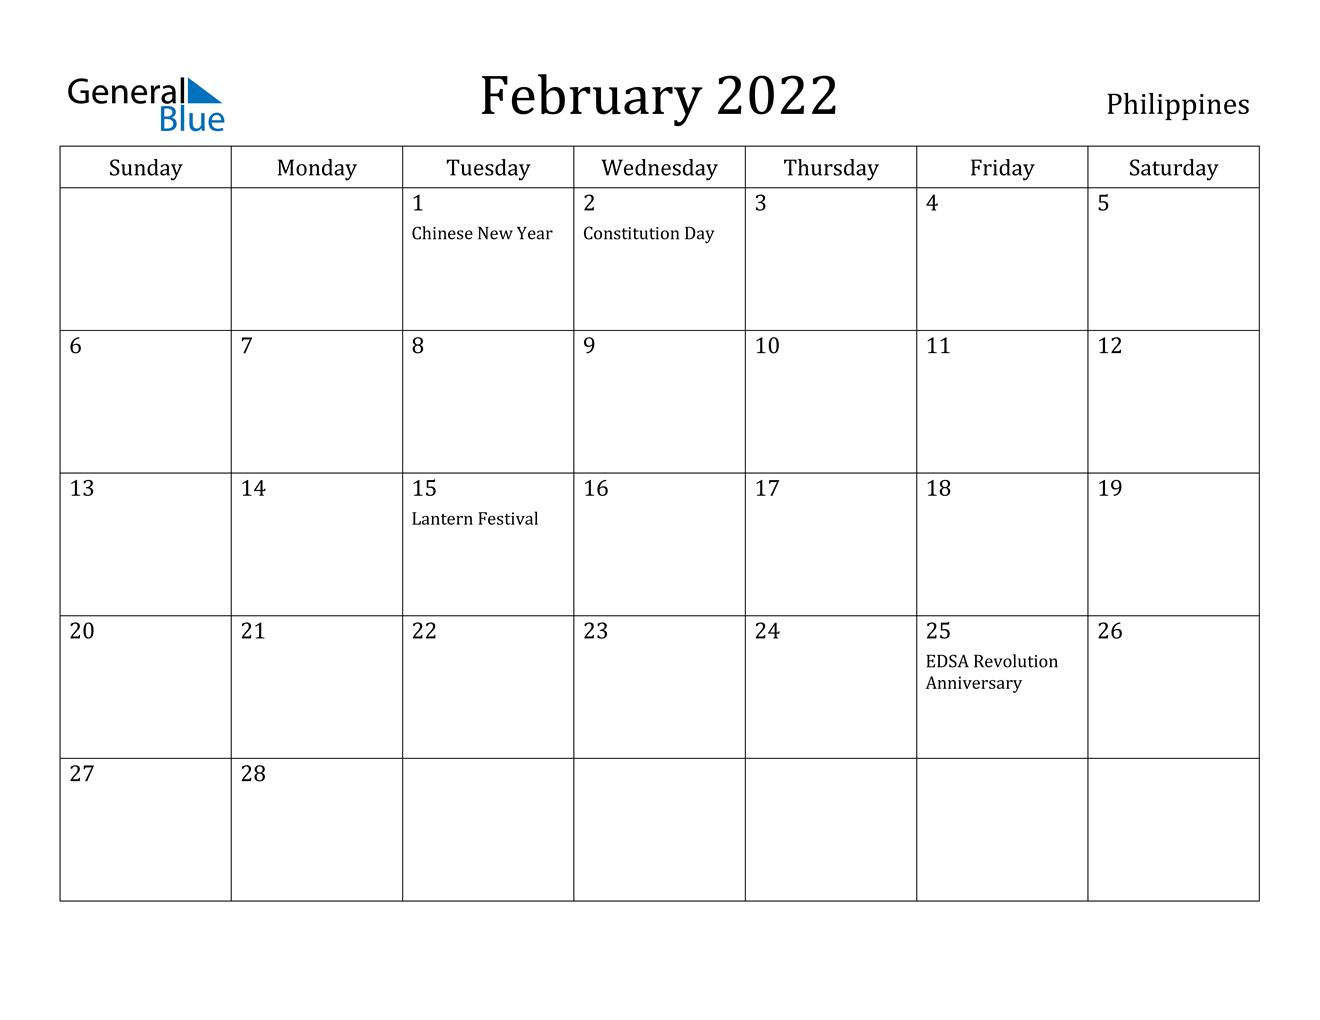 February 2022 Calendar - Philippines Regarding February 2022 Month Calendar Page